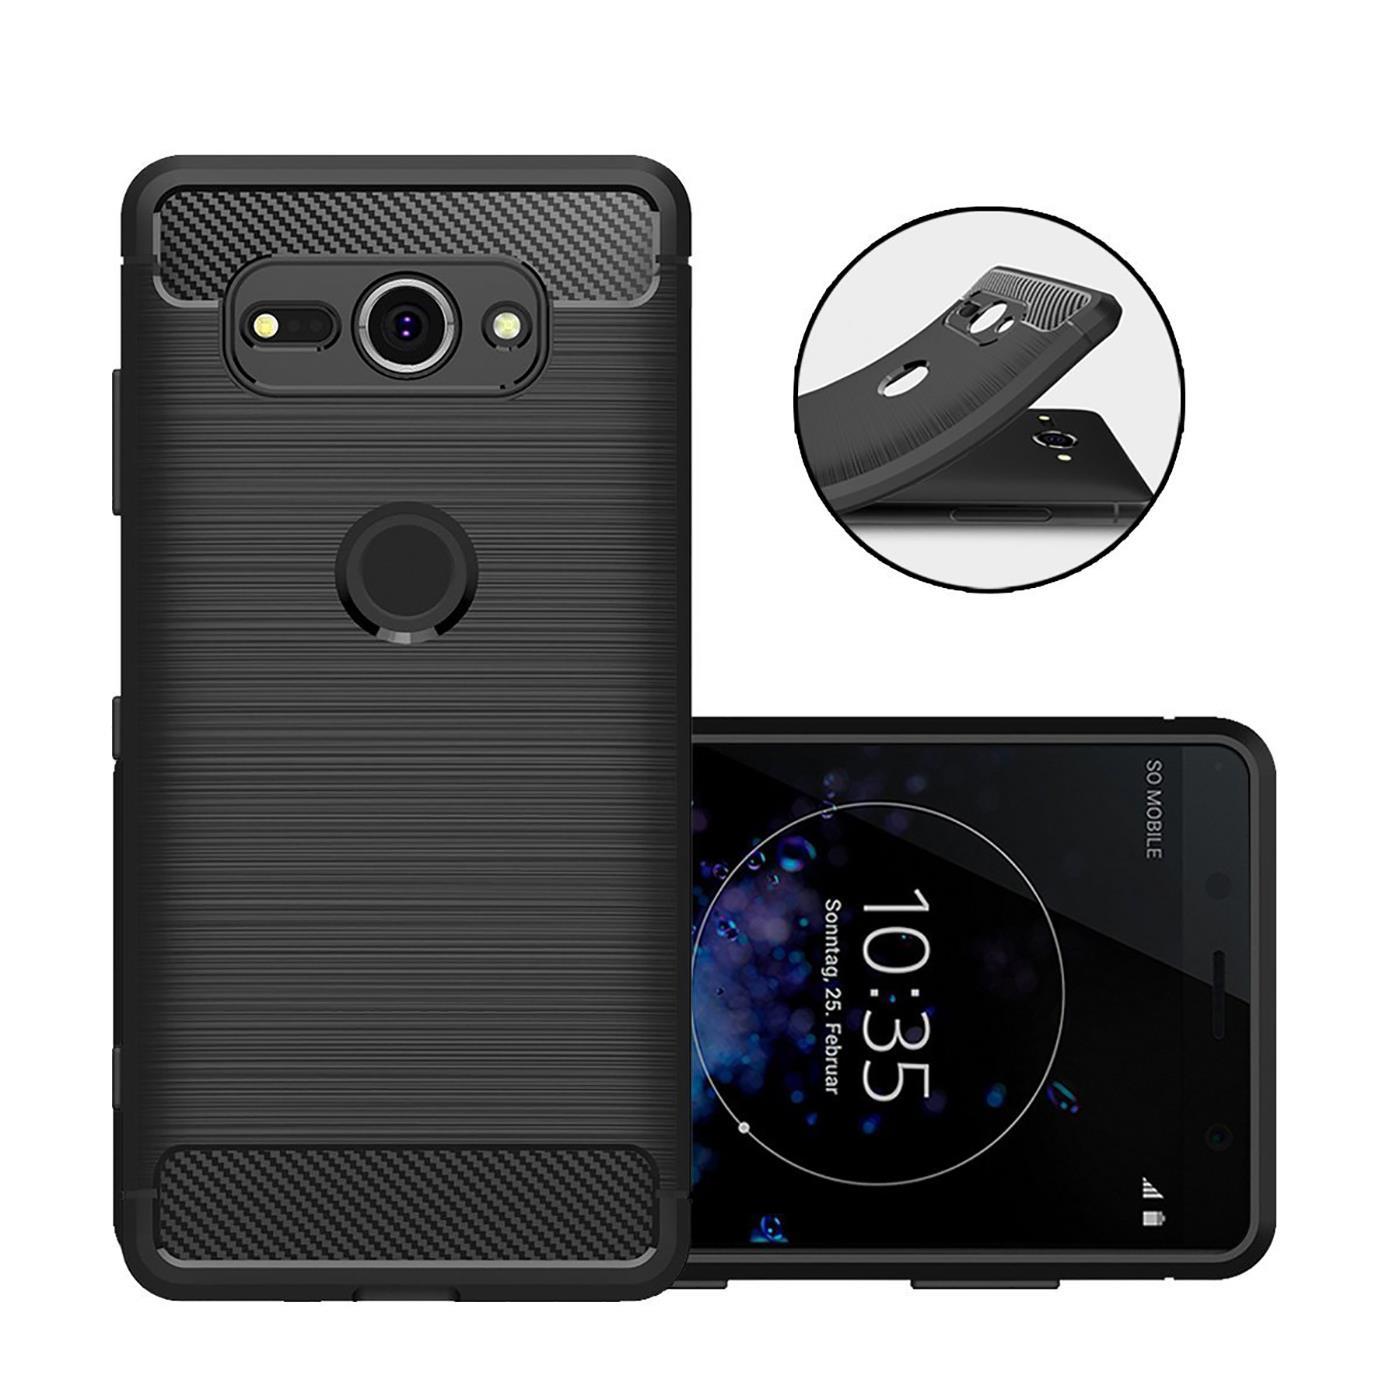 Coque-carbone-pour-Sony-Xperia-xz2-Compact-Etui-de-protection-portable-case-hybride-TPU-Cover miniature 9